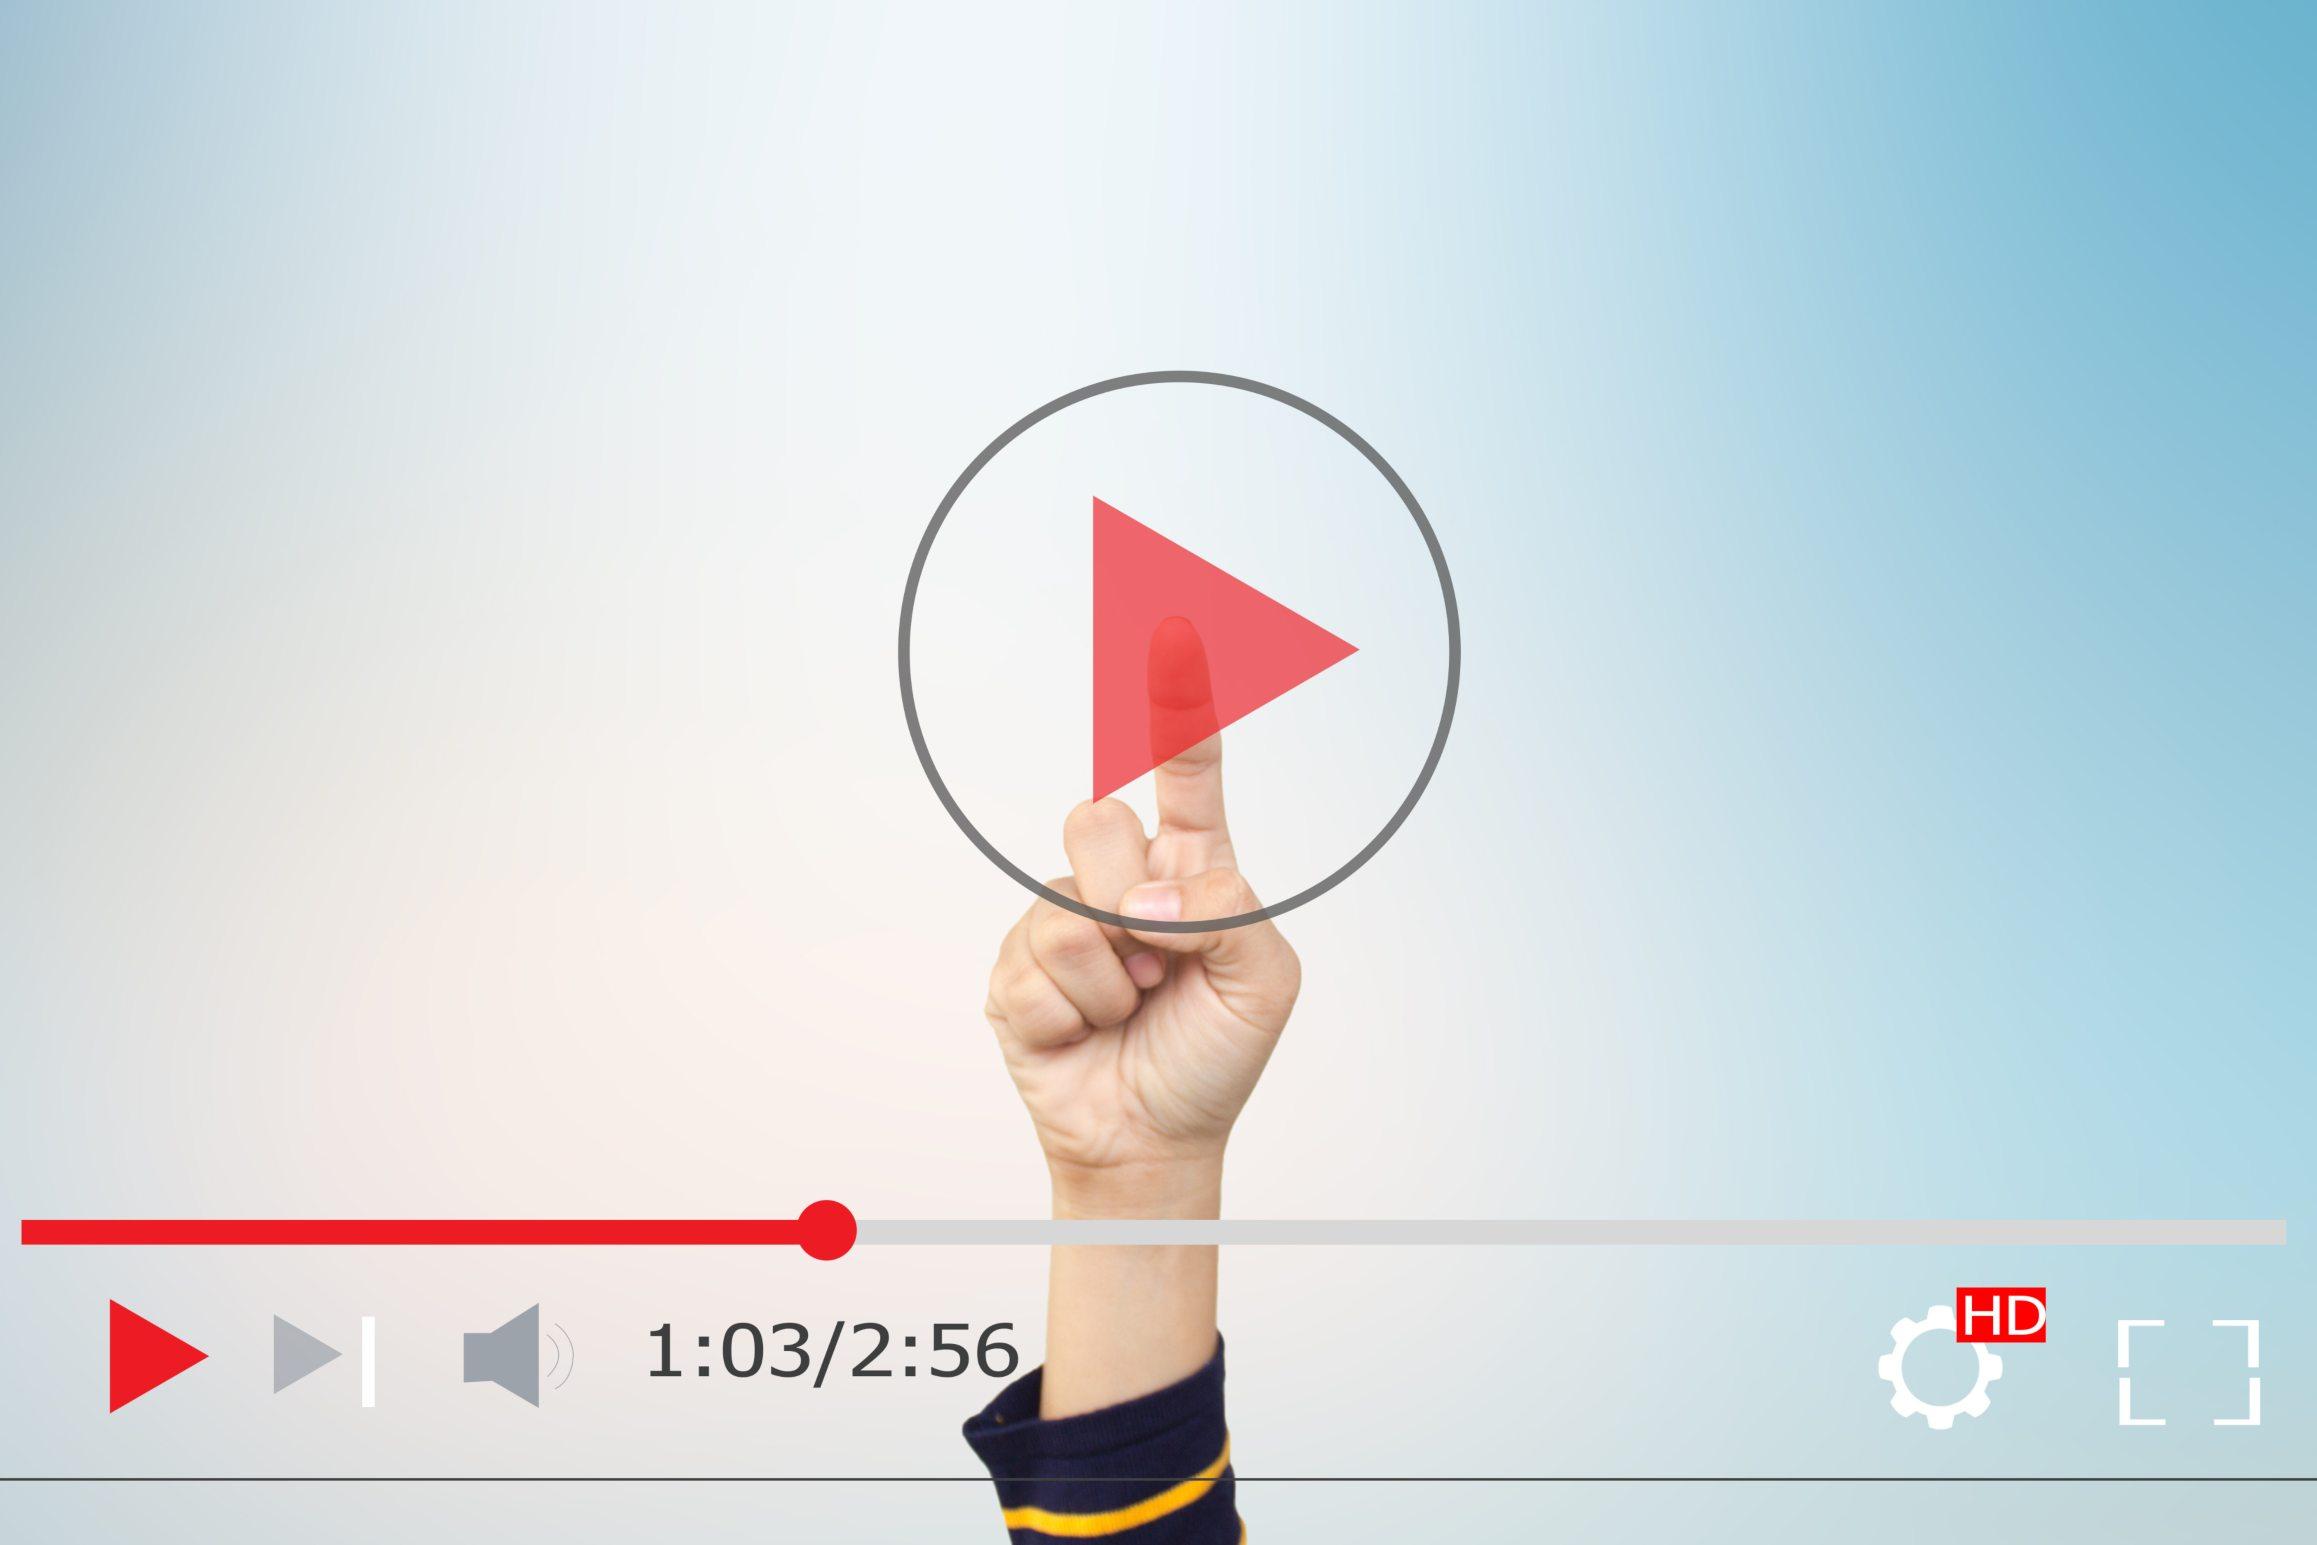 Tipos de vídeos para mantener clientes conectados